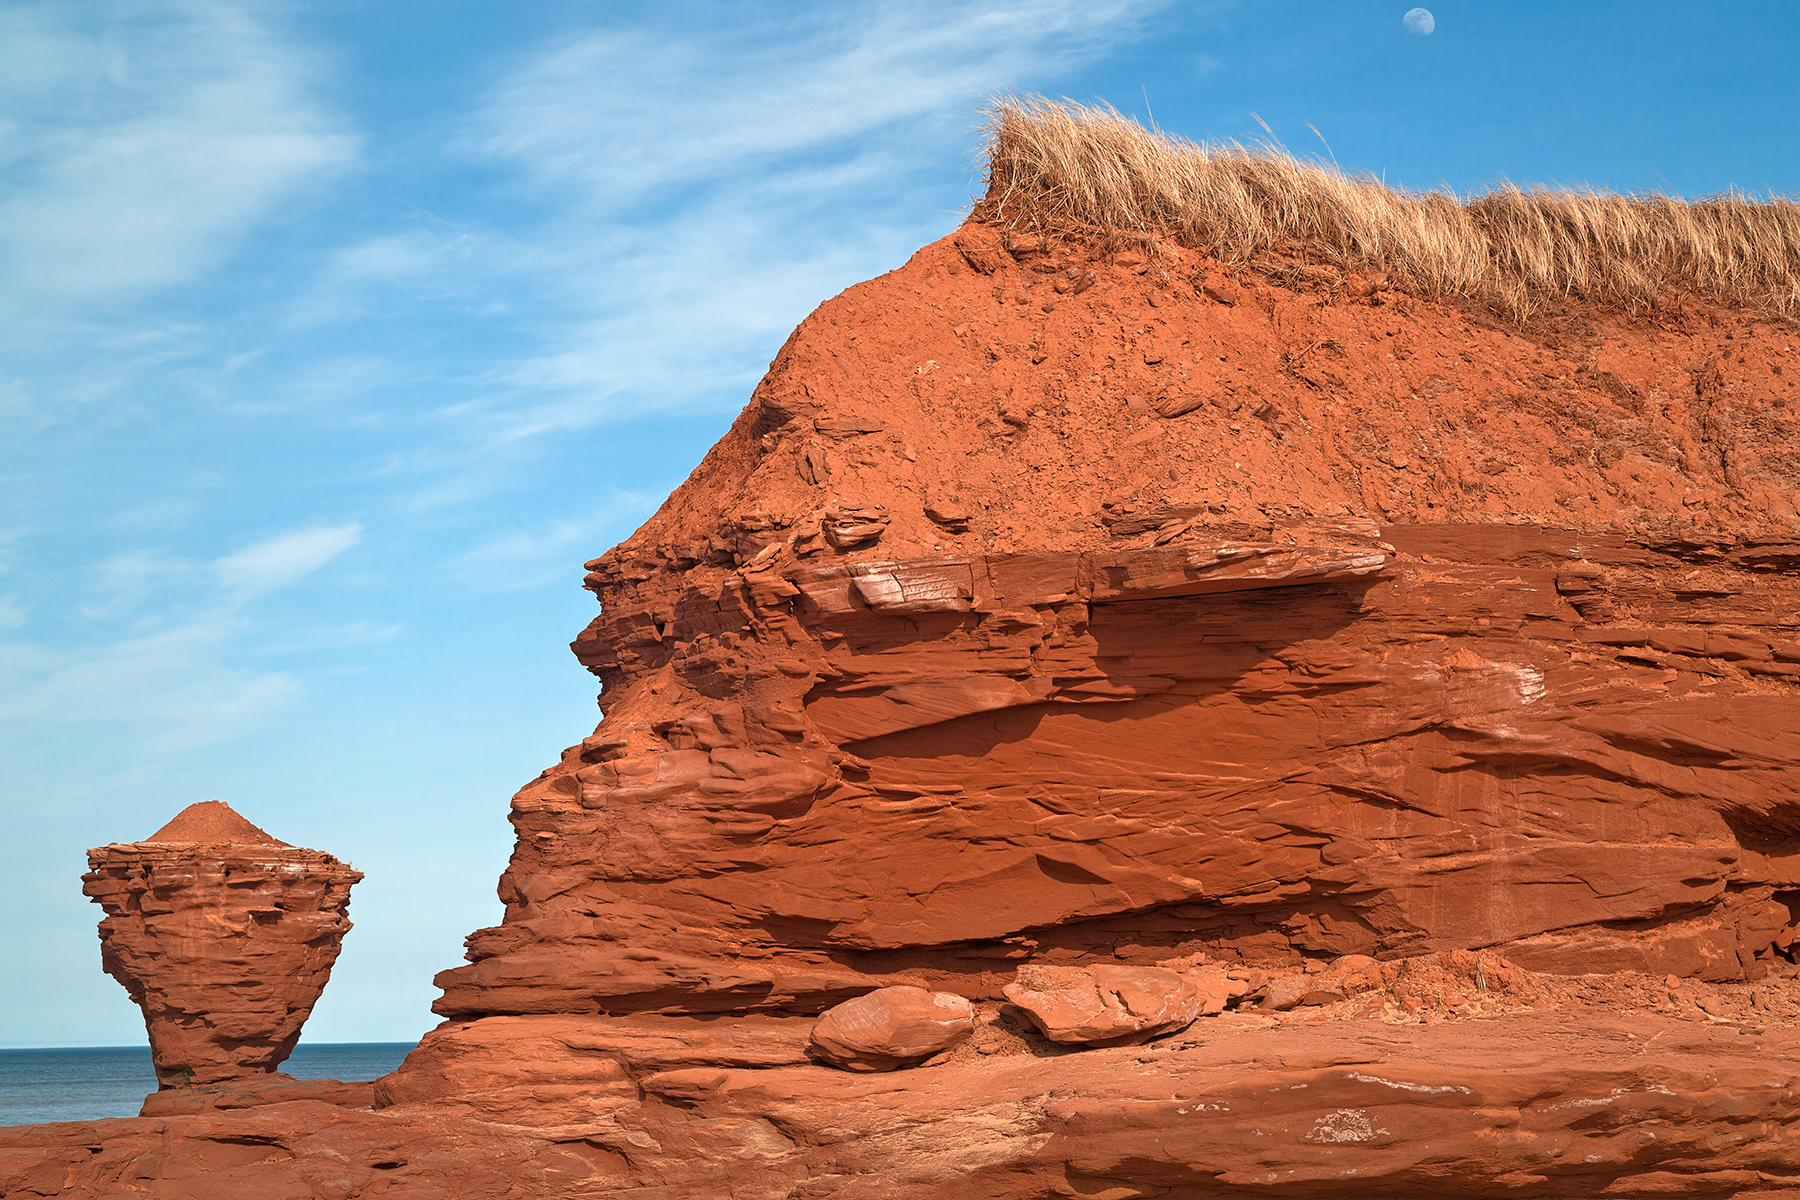 Mohawk Teapot Rock - HDR, Outdoors, Outside, Outdoor, Orange, HQ Photo